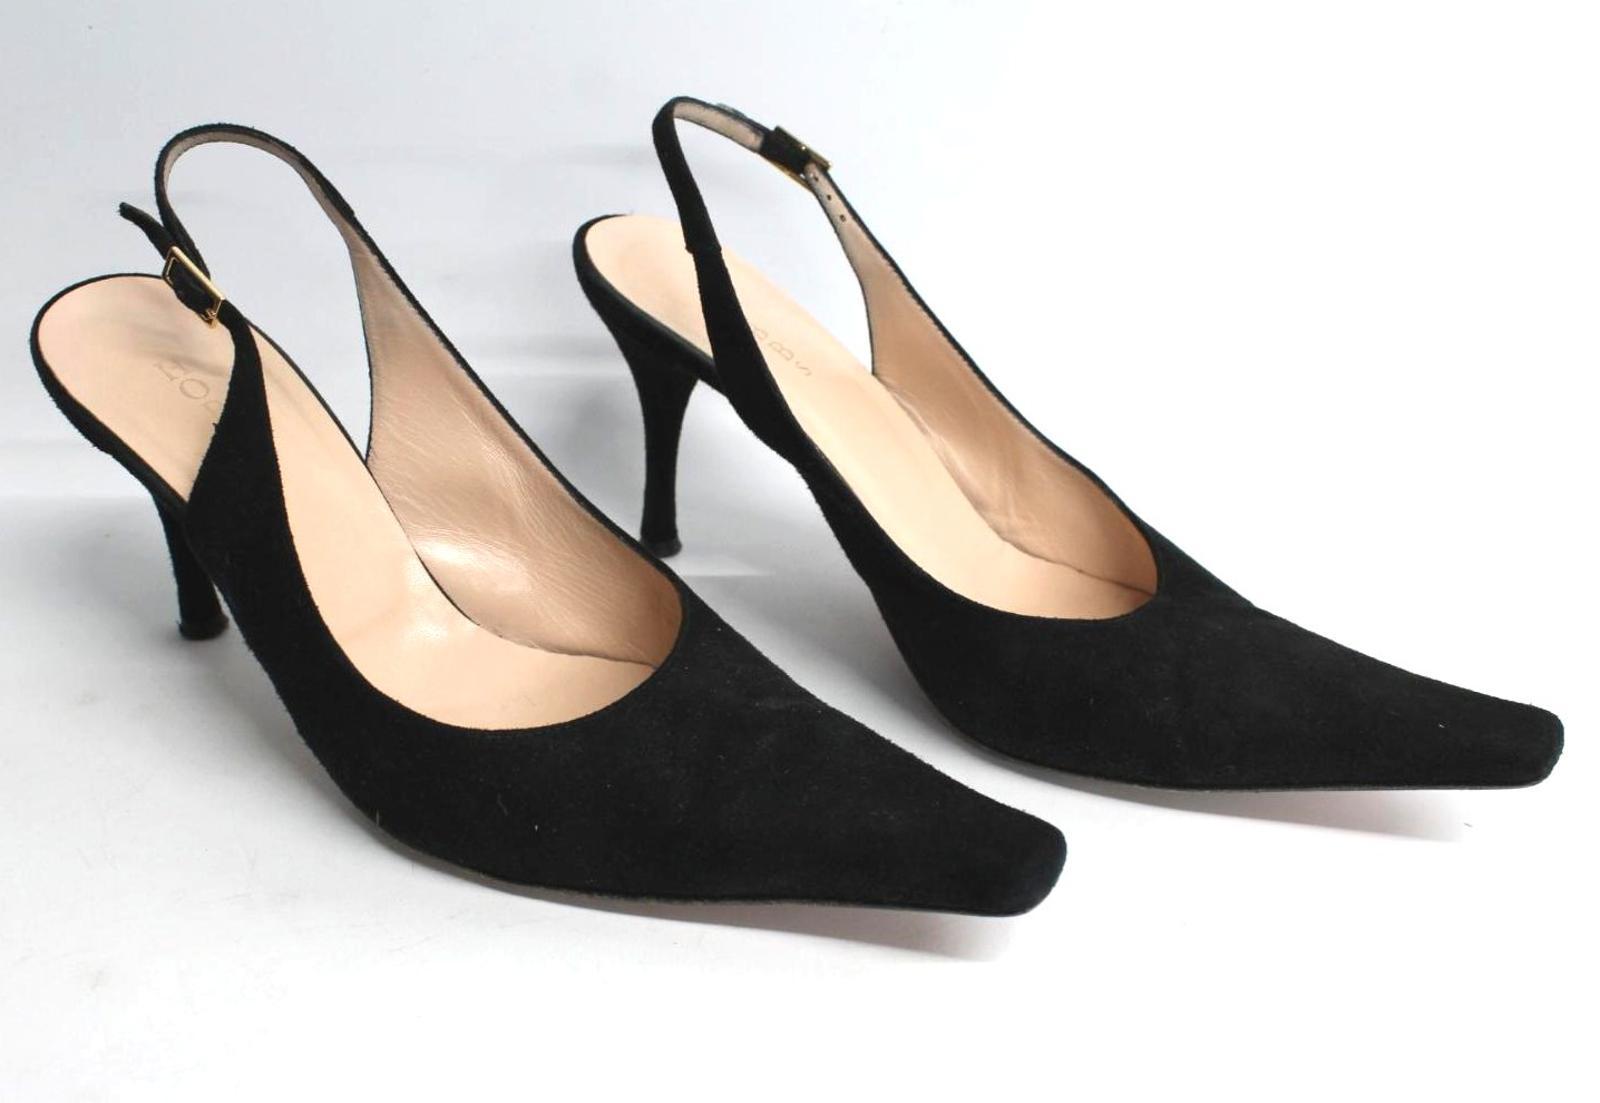 Hobbs-femmes-en-daim-noir-Sling-Arriere-bout-pointu-et-talon-aiguille-Chaussure-UK6-5-EU39-5 miniature 2